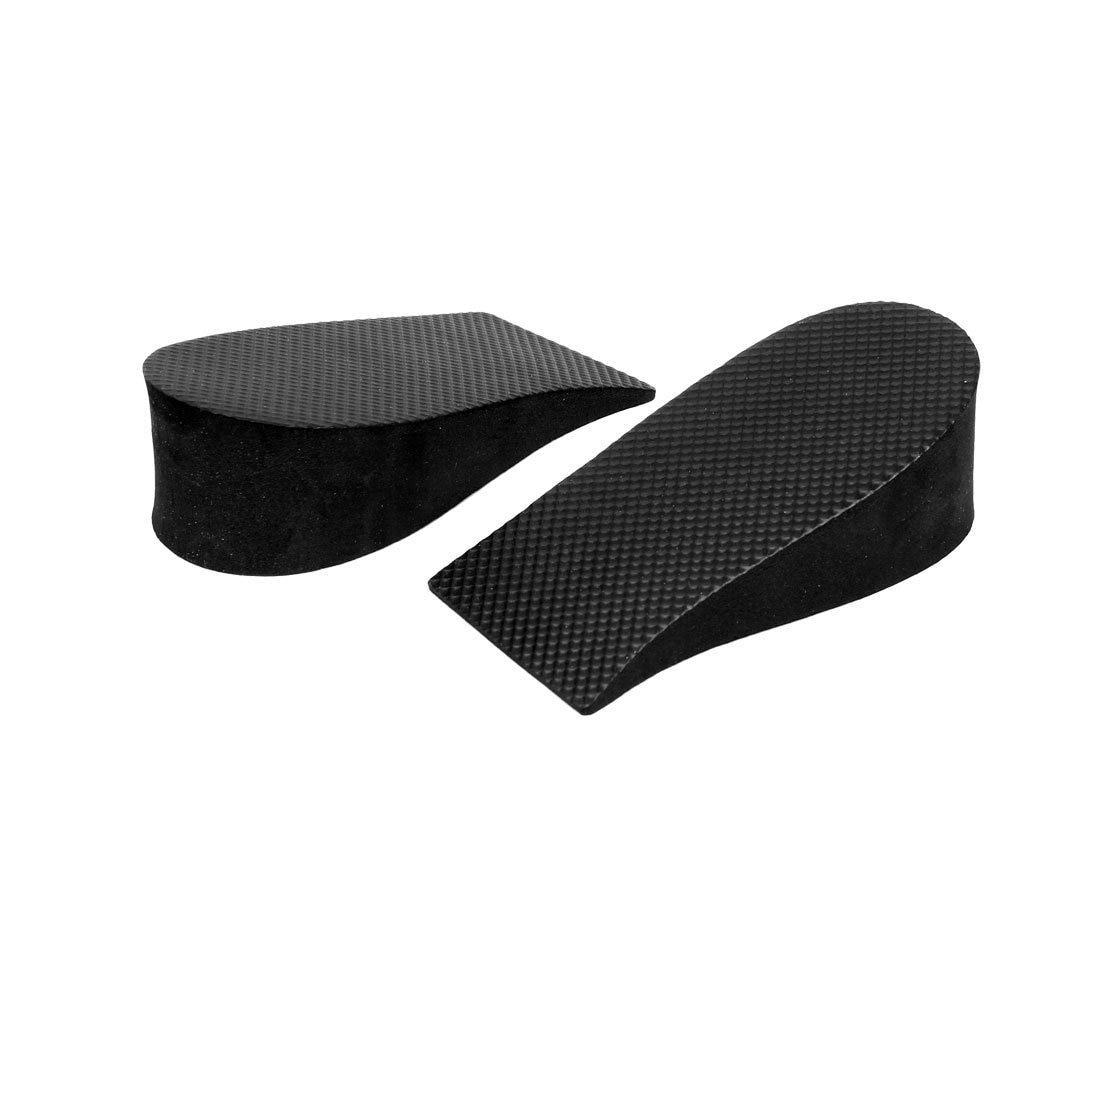 2 Pcs 1.5 Height Increase Heel Lifts Foam Pads Insoles Black